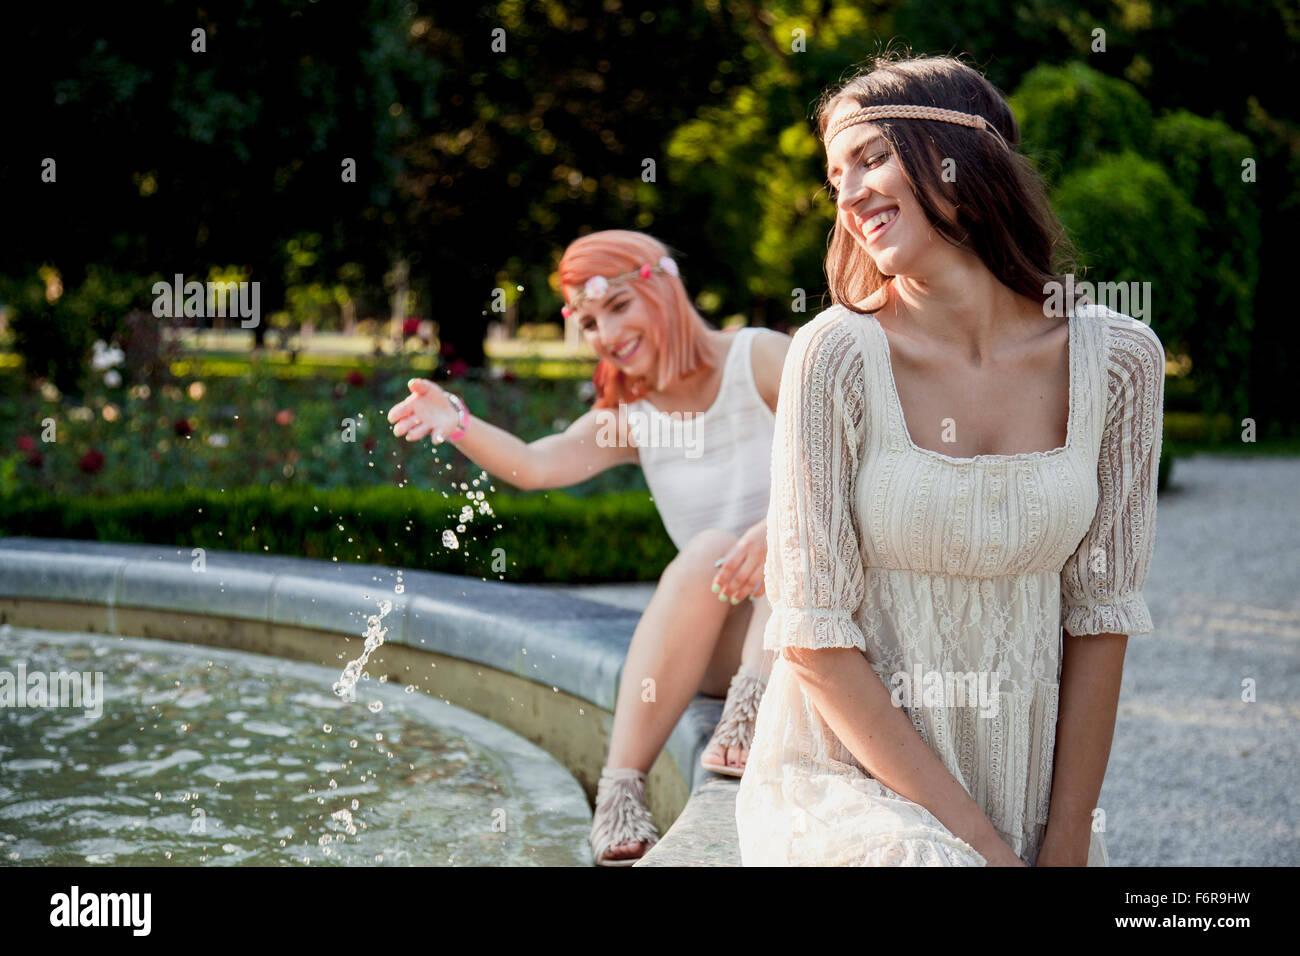 Young women in hippie style fashion splashing water - Stock Image